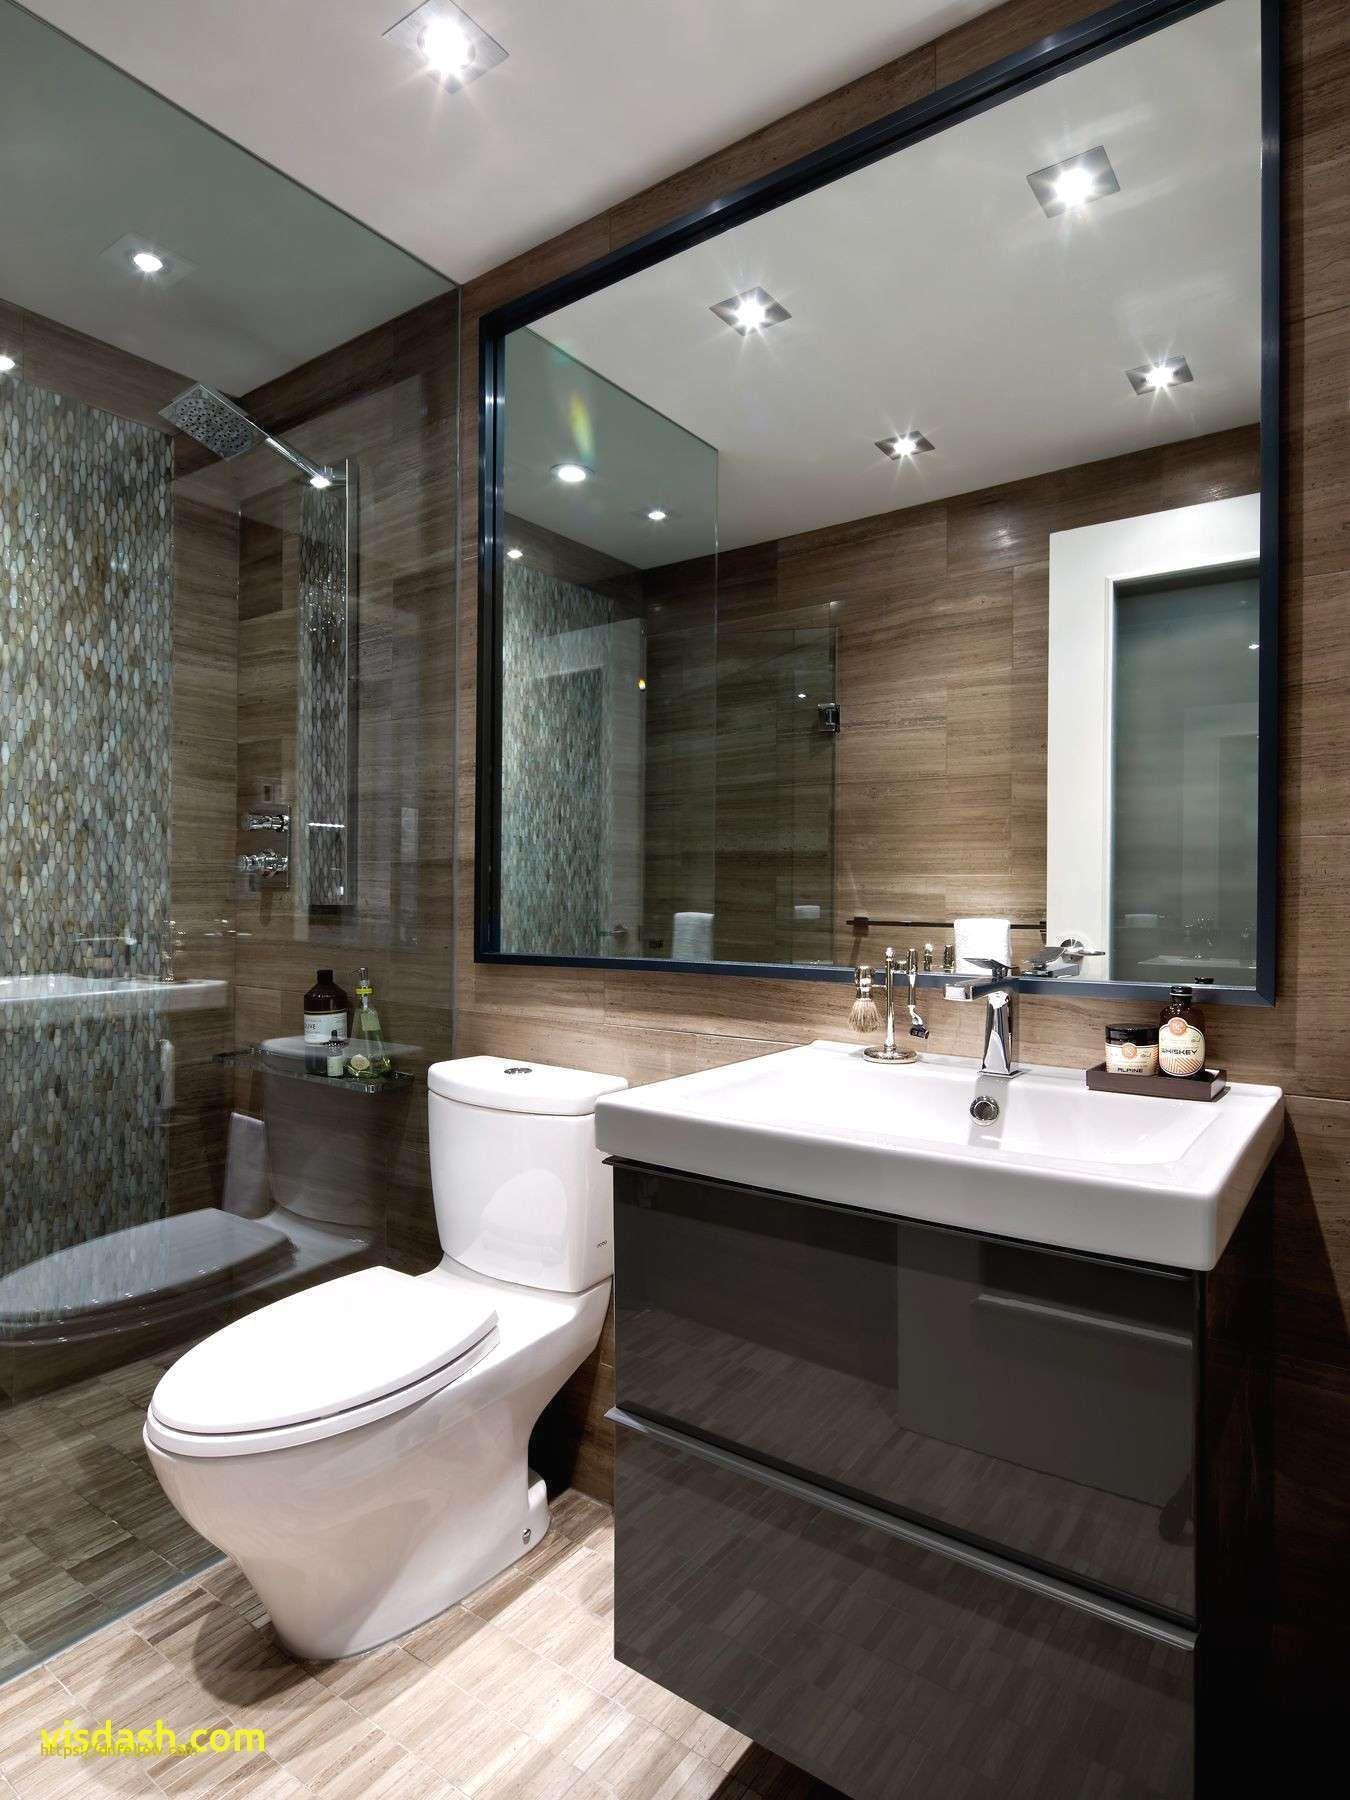 New 7 X 4 Bathroom Designs Https Dnfellow Com Small Bathroom Remodel Condo Bathroom Bathroom Design Small Small bathroom designs for home